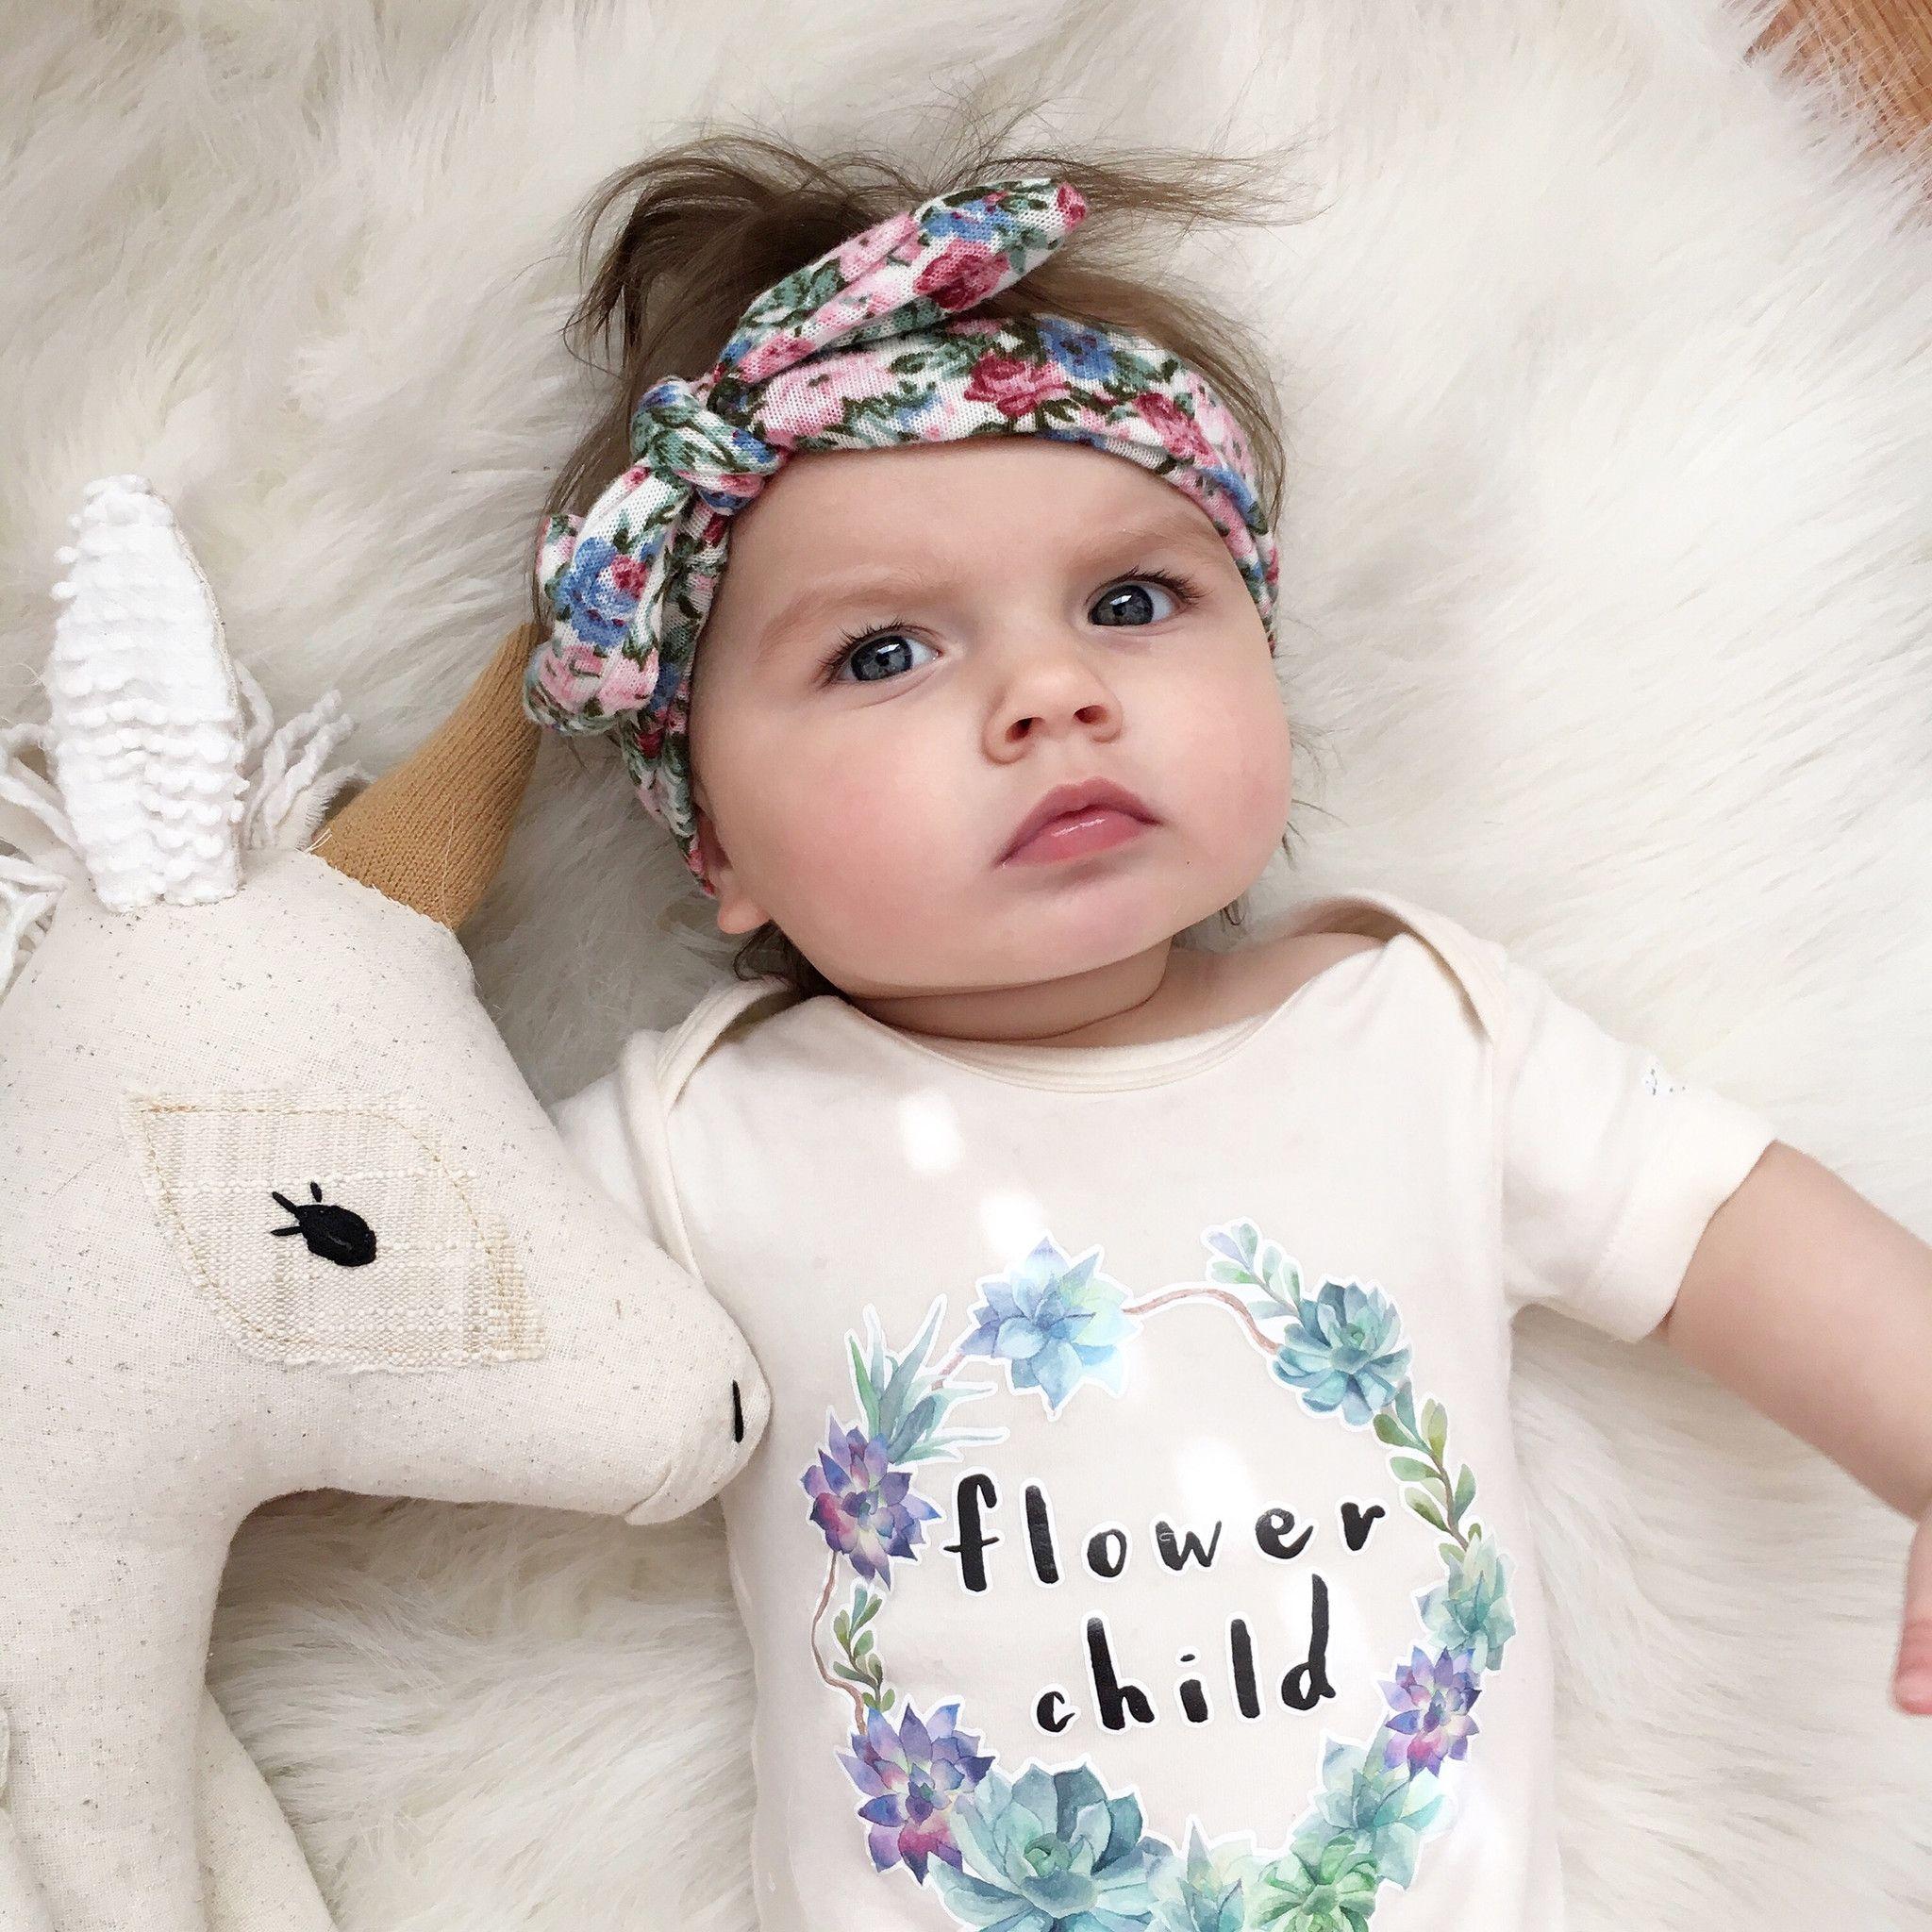 Flower Child, Boho, Hippie, Floral, Baby, Girl, Infant ...